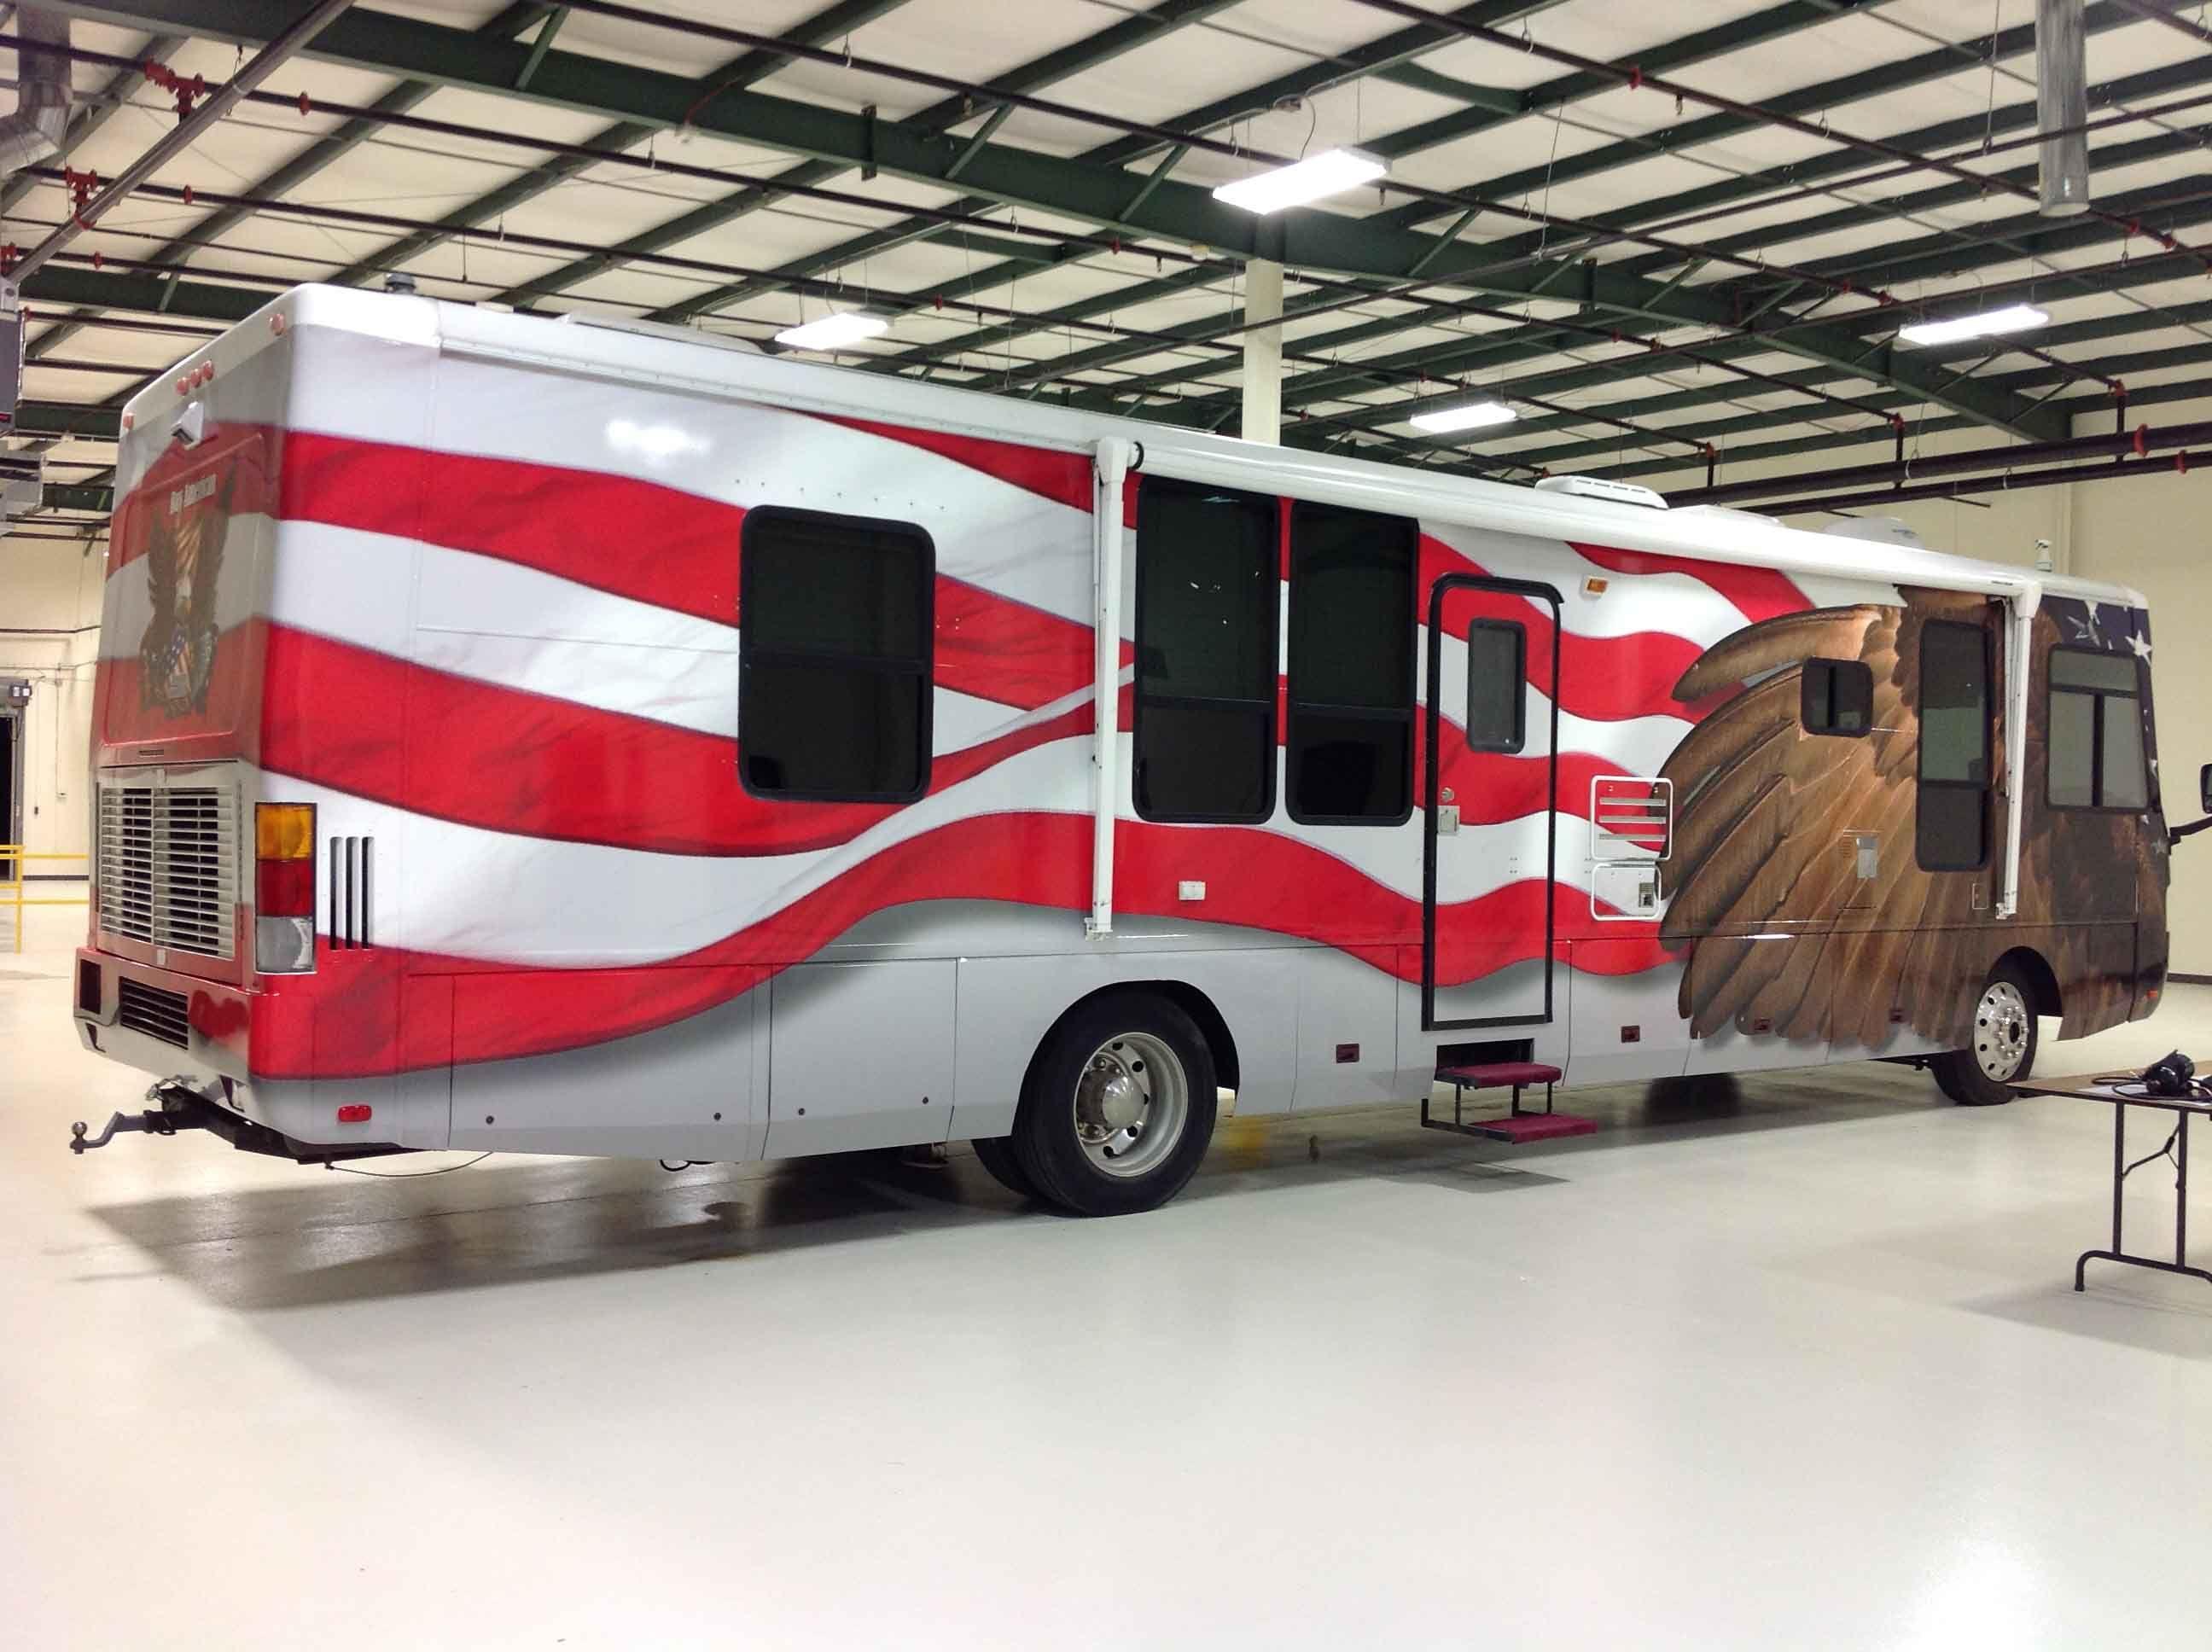 American Flag RV Side | Memorial Day Remeberance | Vehicles